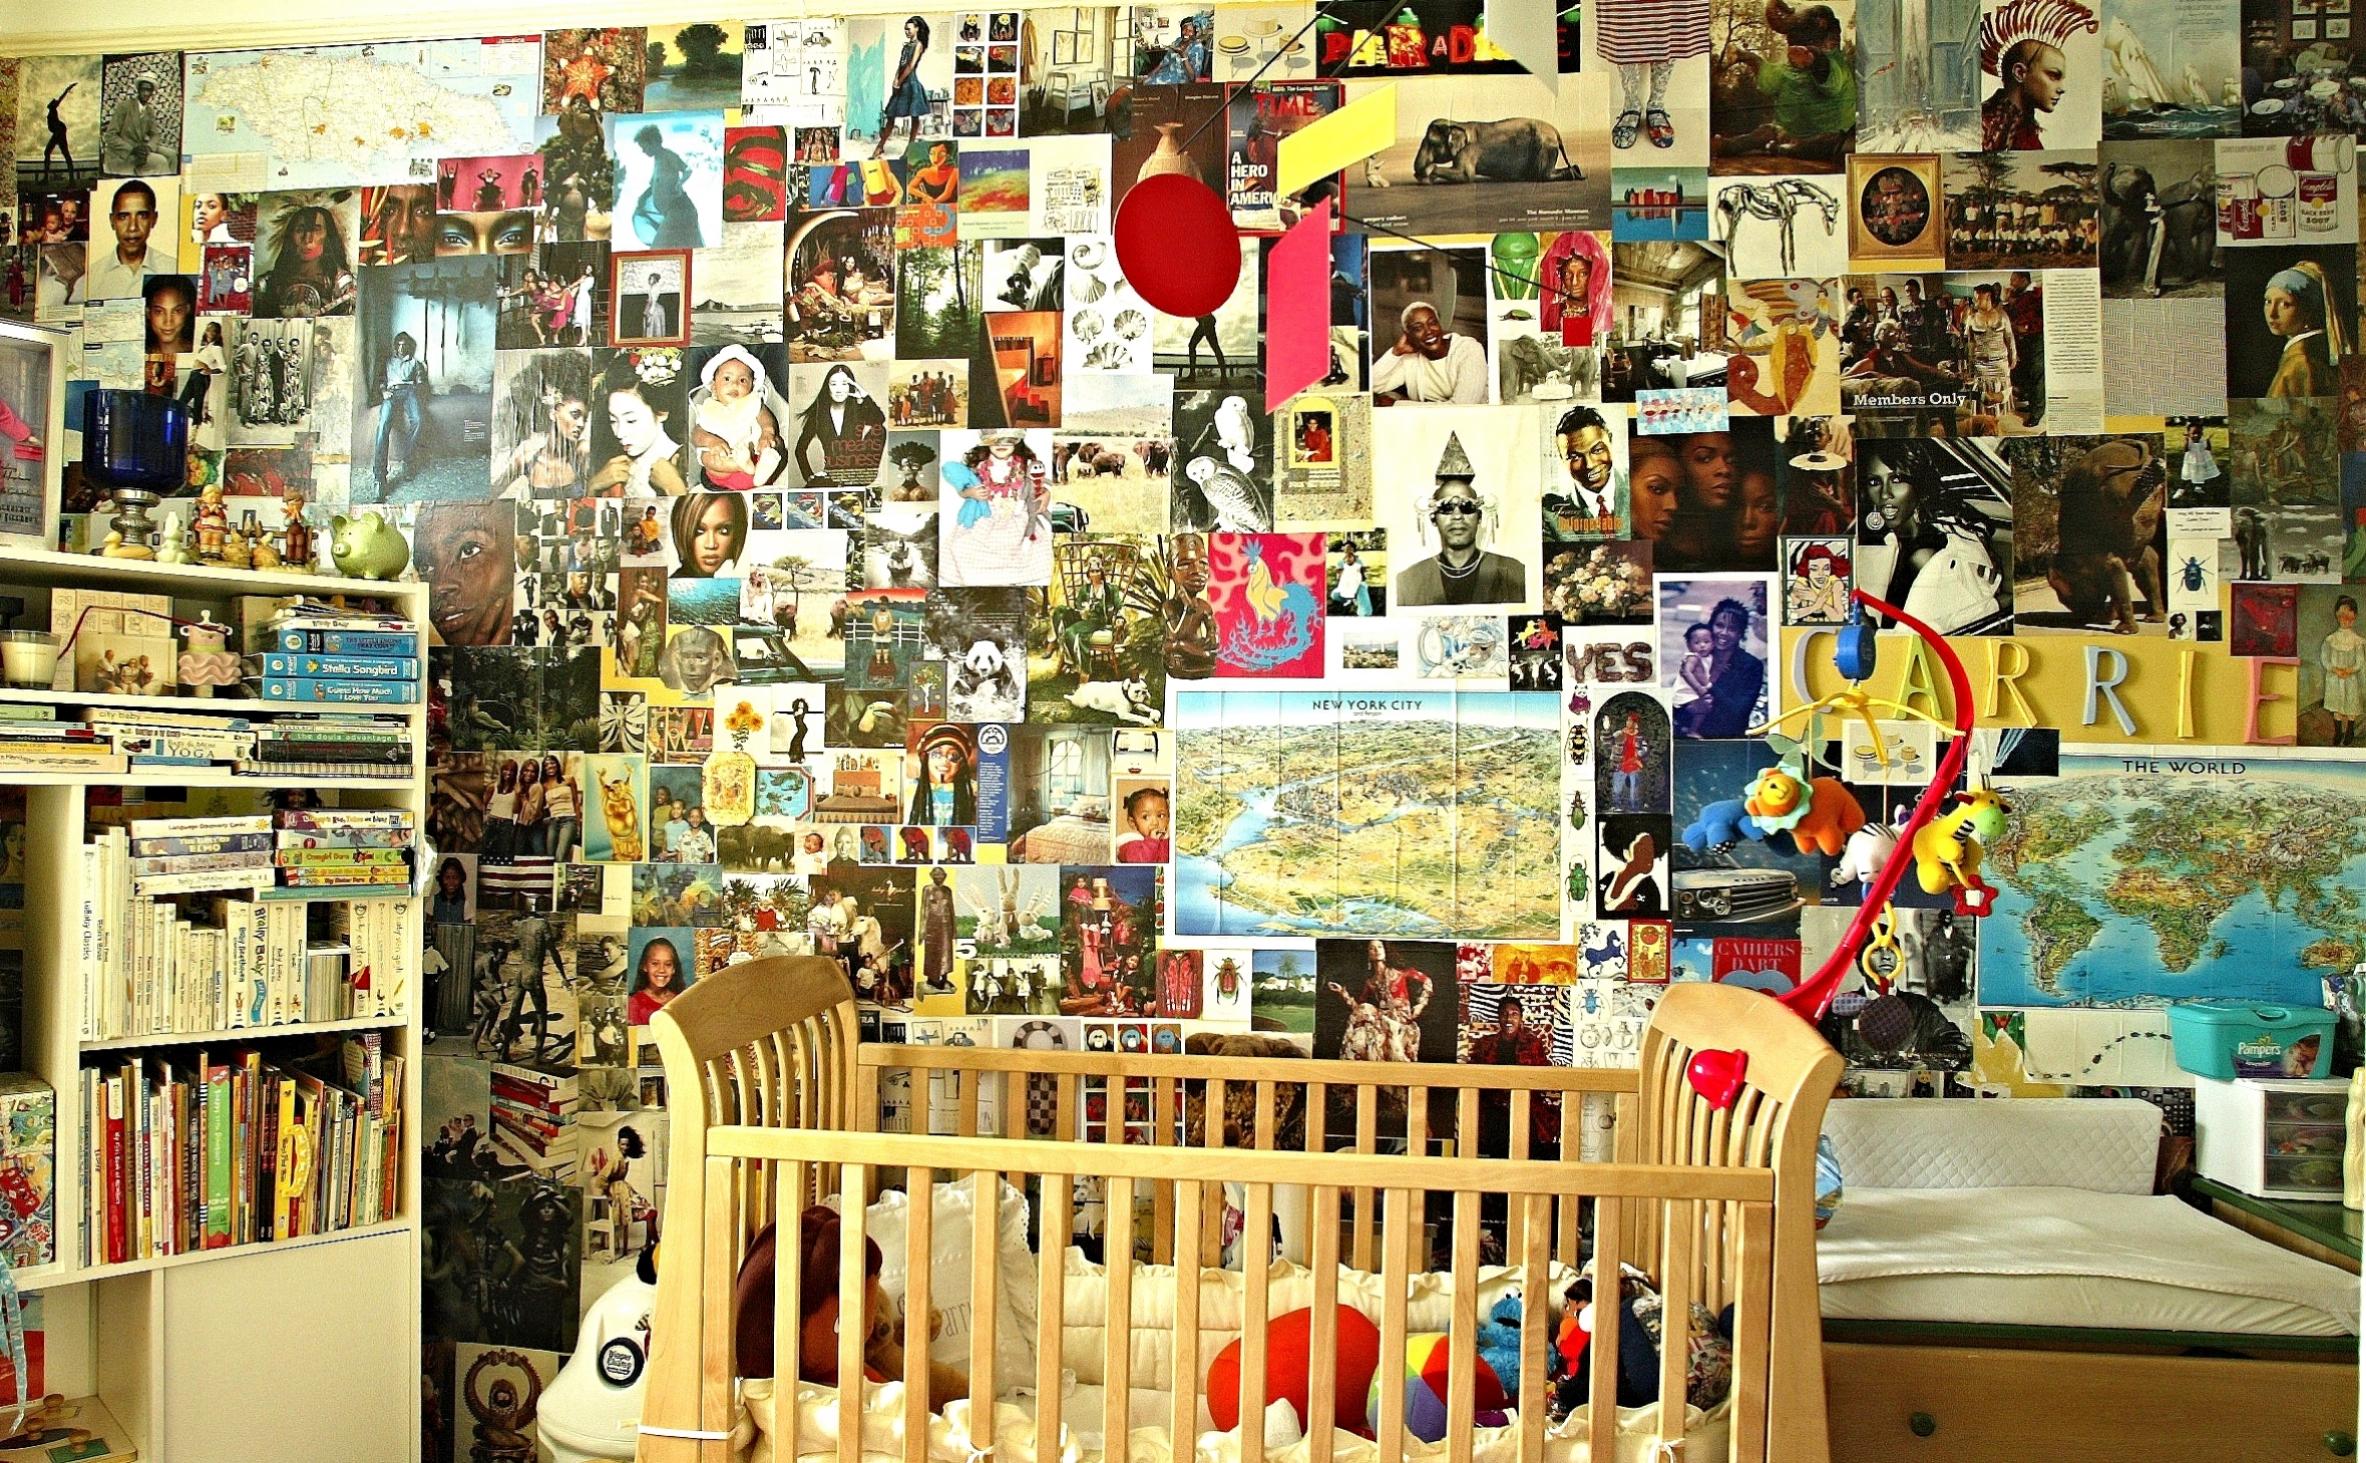 Girl's Bedroom Mural-Harlem,NY.jpg